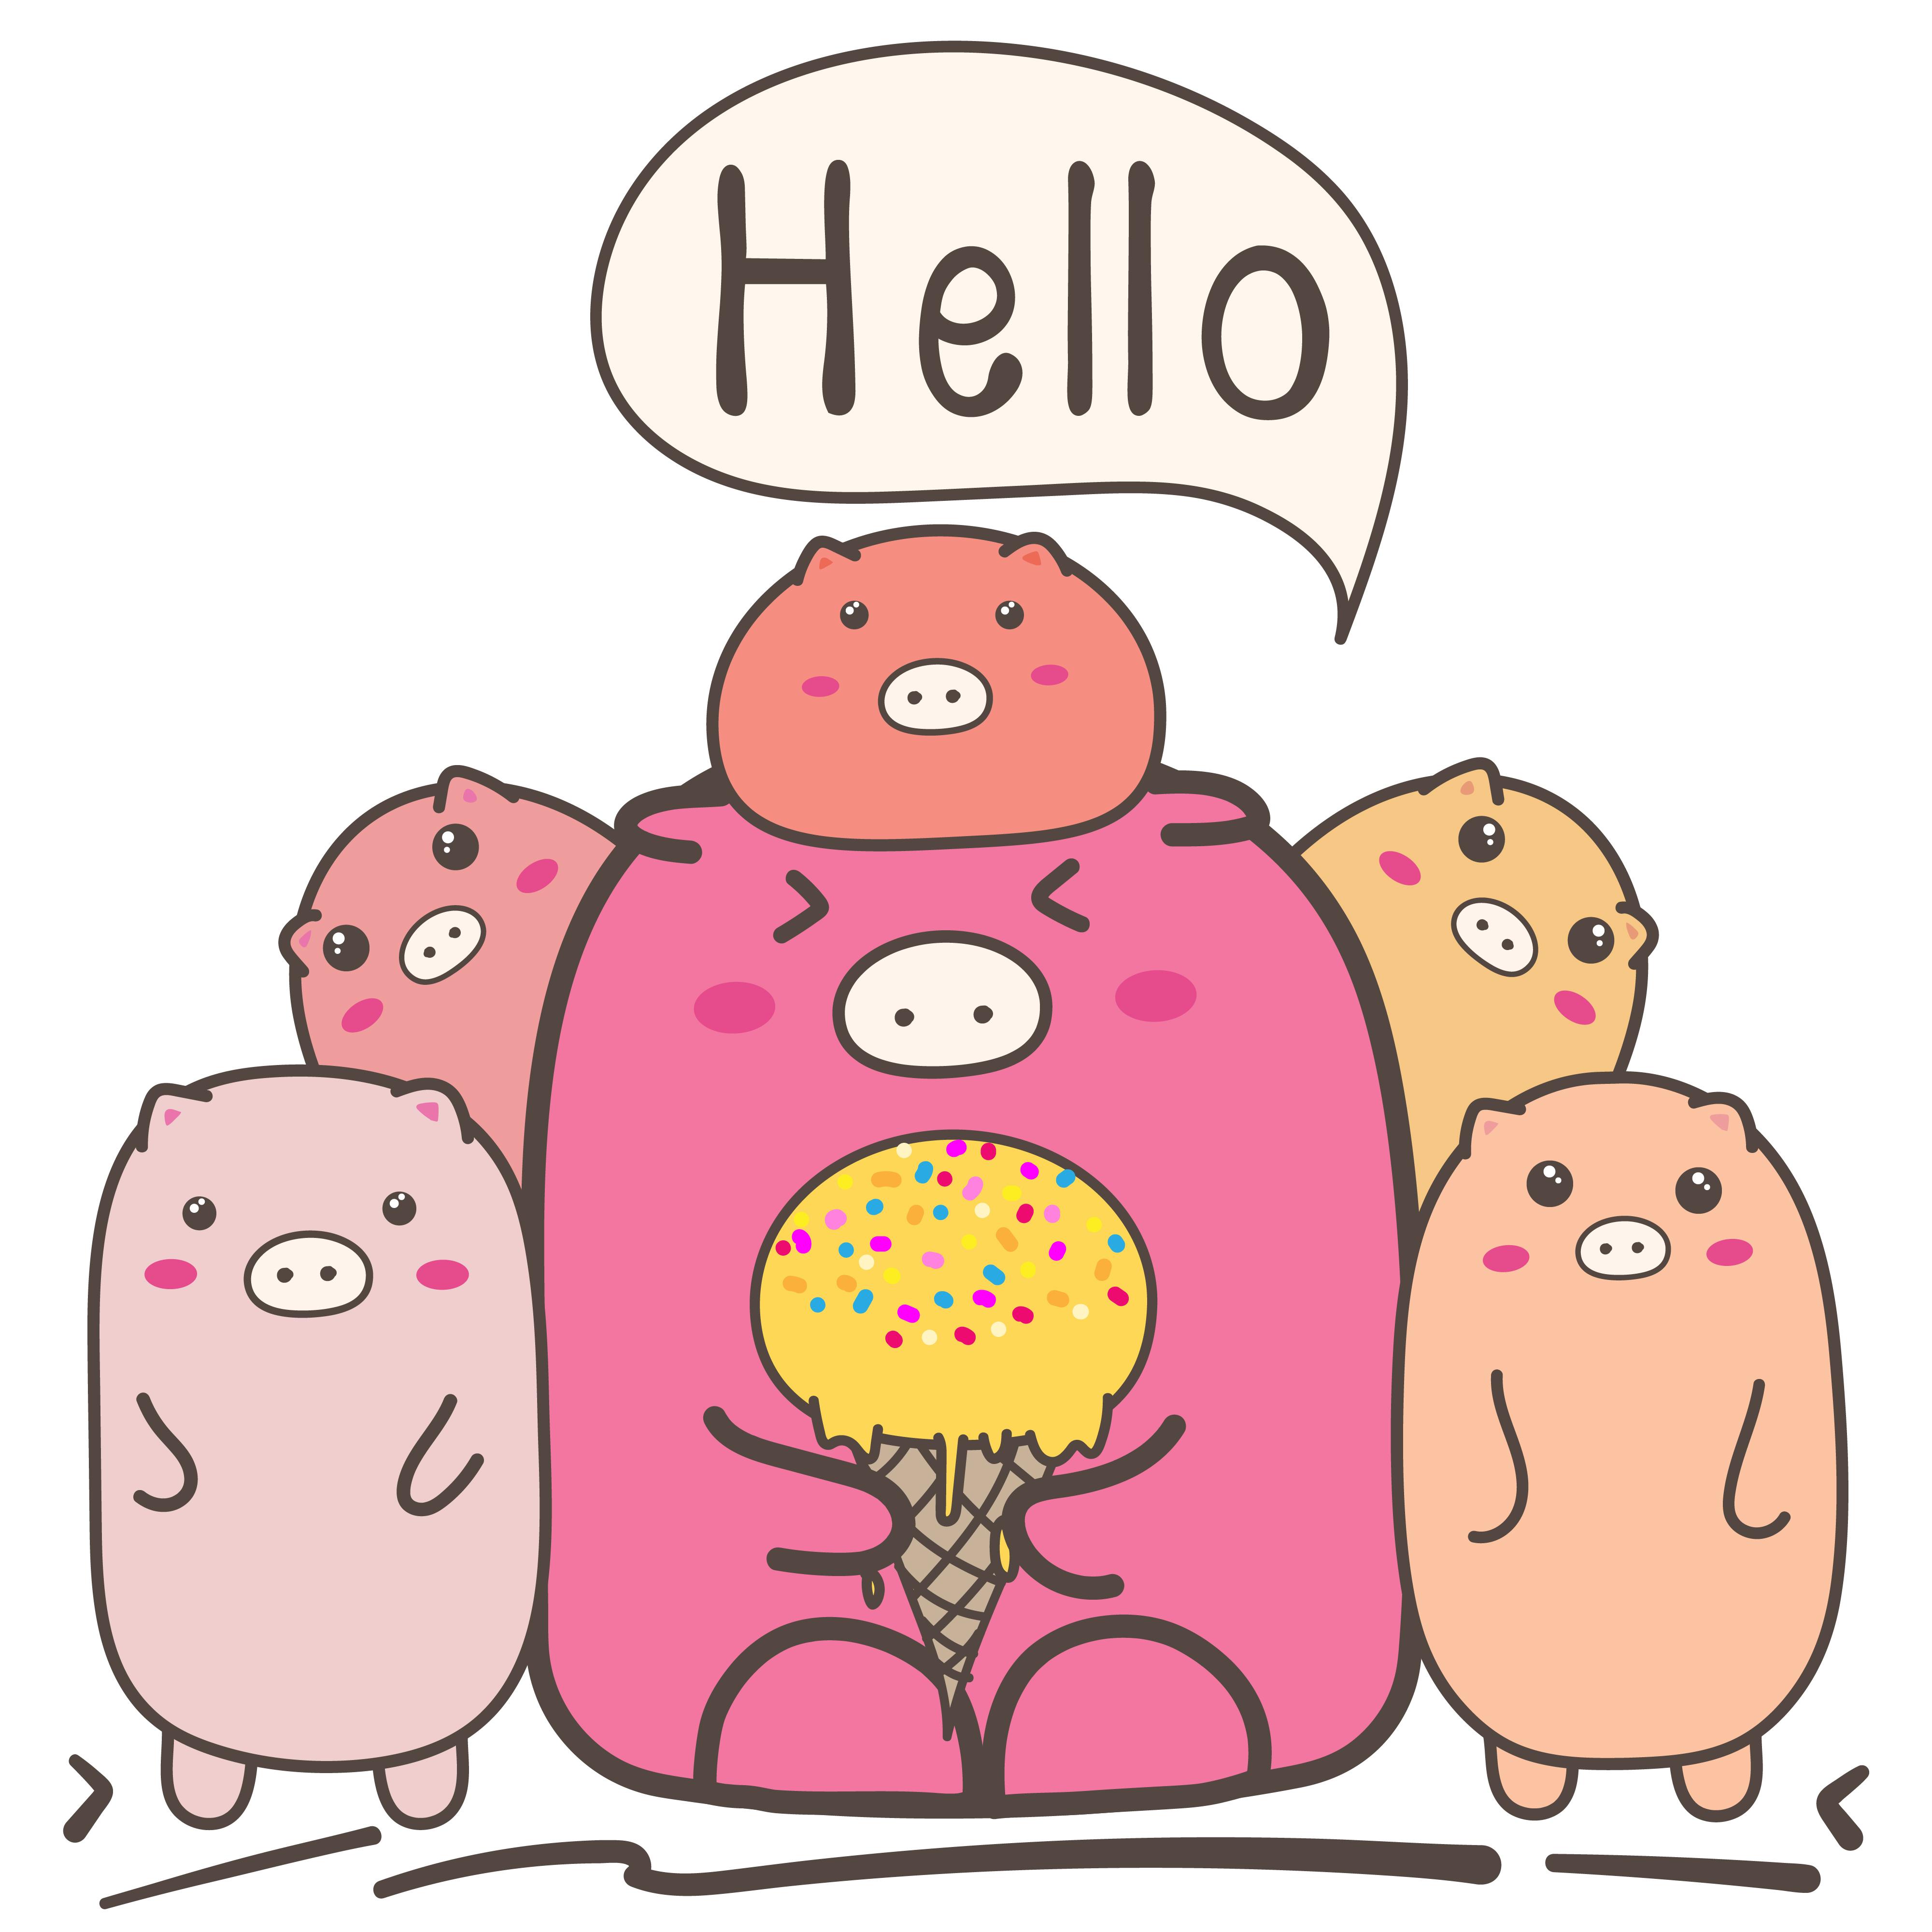 Cute Cartoon Pigs Family. - Download Free Vectors, Clipart ...